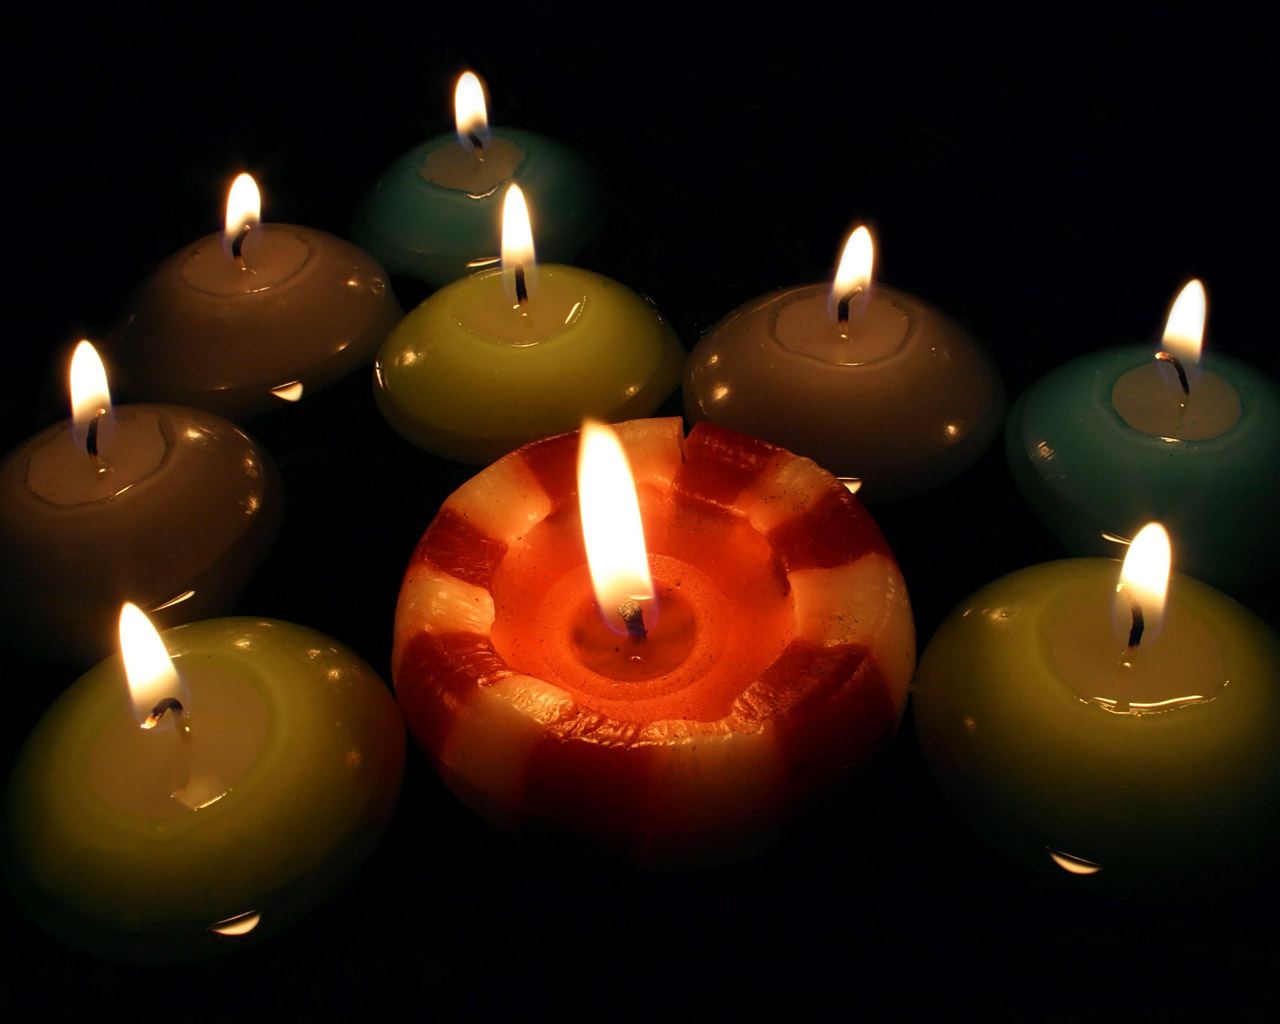 Round candles wallpaper   Candles Wallpaper 4091689 1280x1024